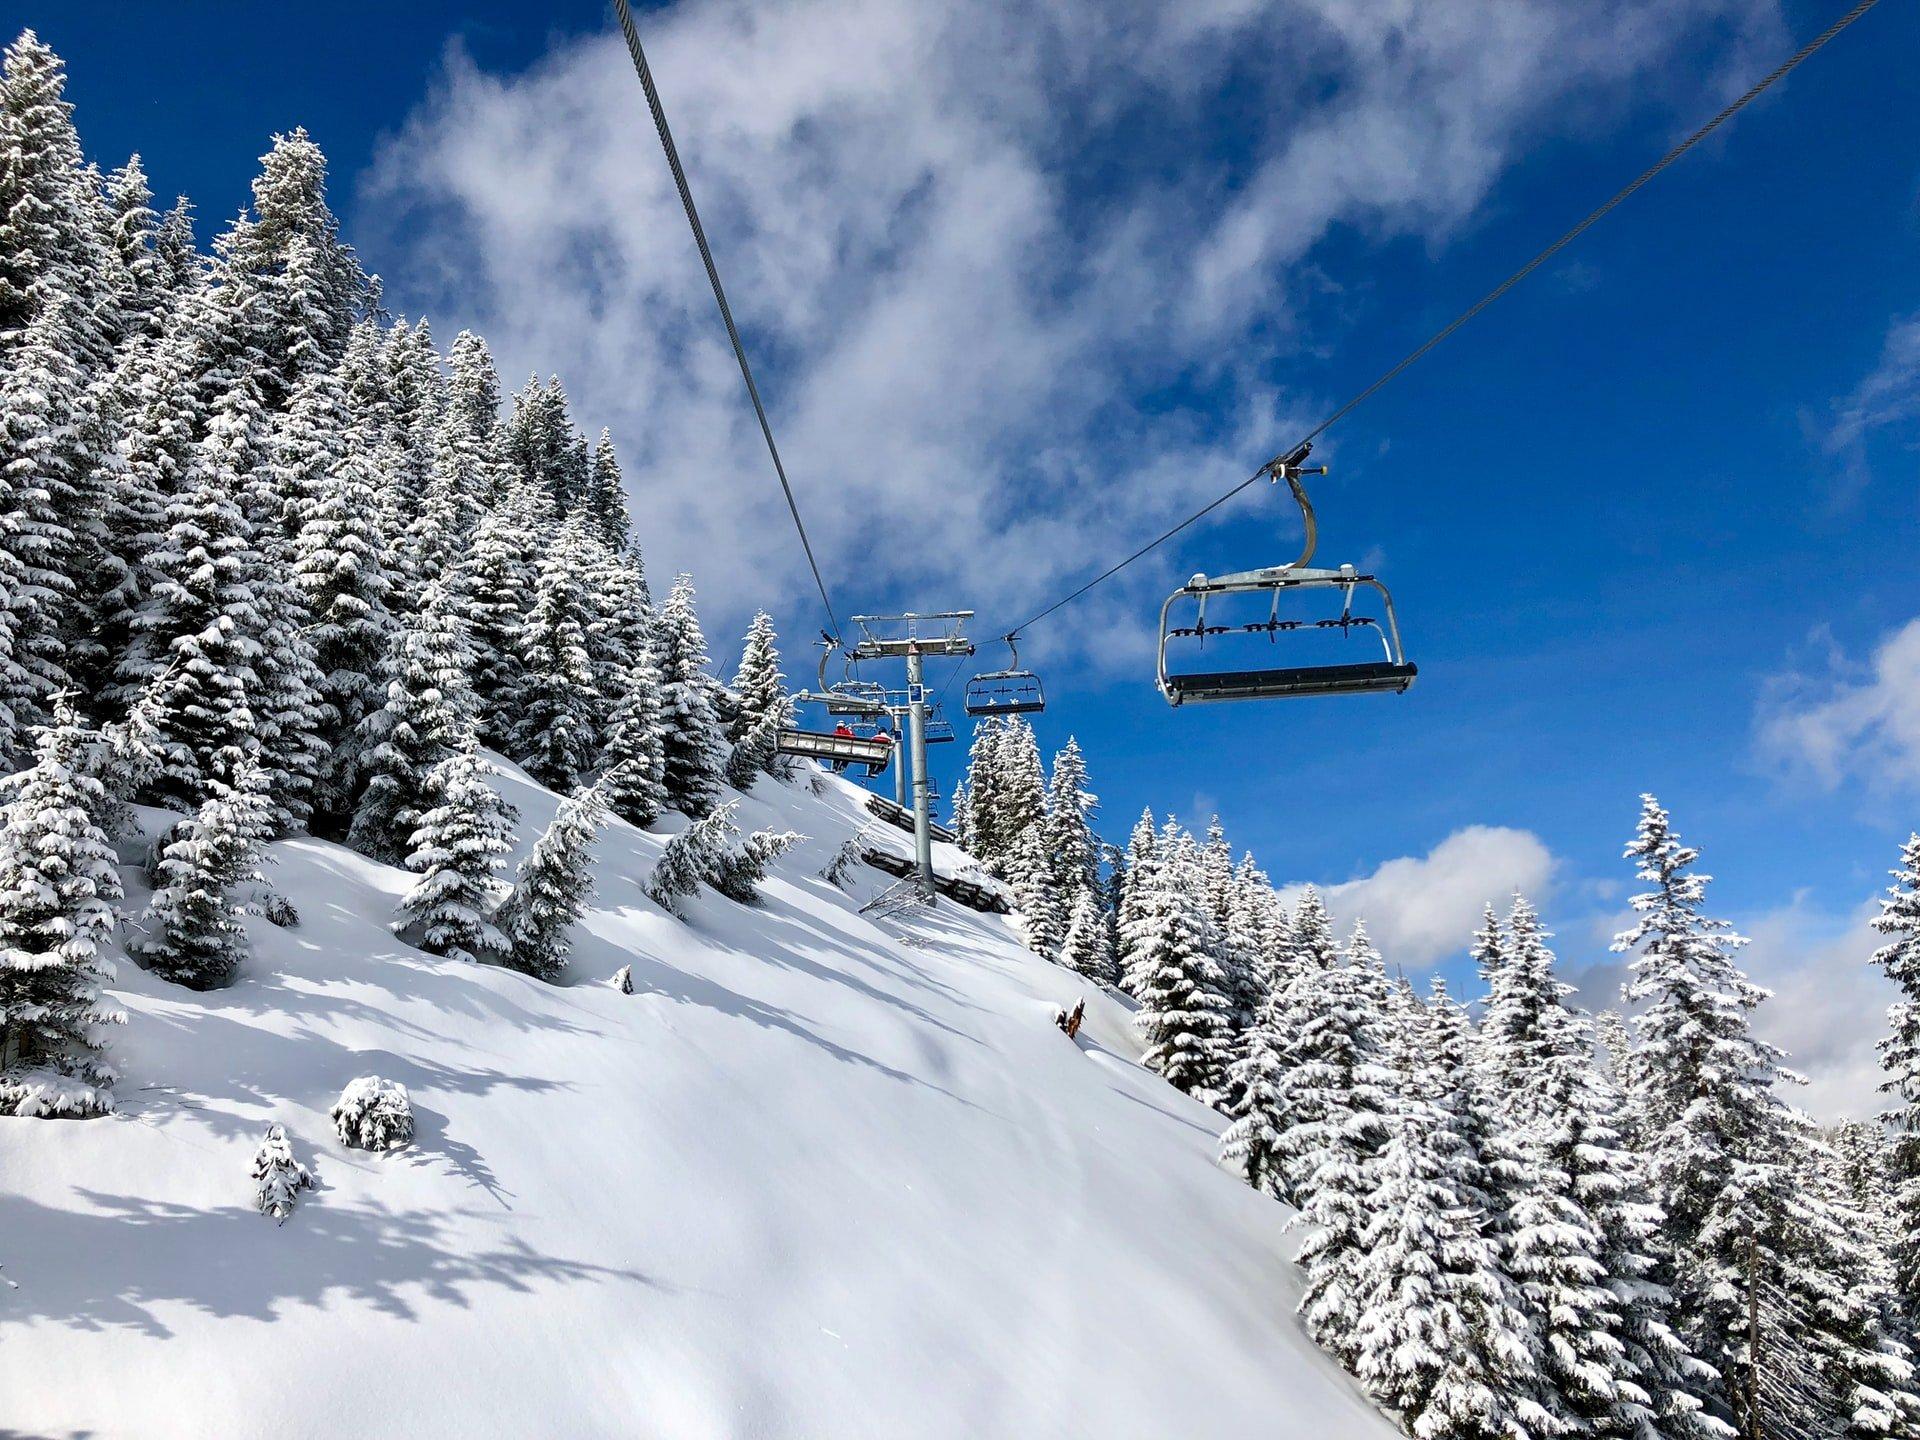 Urlaub im Dezember in Tirol